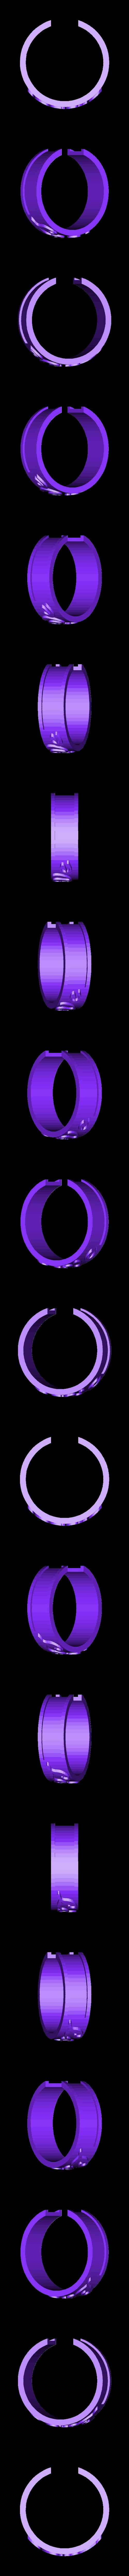 anillo love 20 abierto hendidura 2.stl Télécharger fichier STL gratuit Anillo / Ring Love • Design pour impression 3D, amg3D